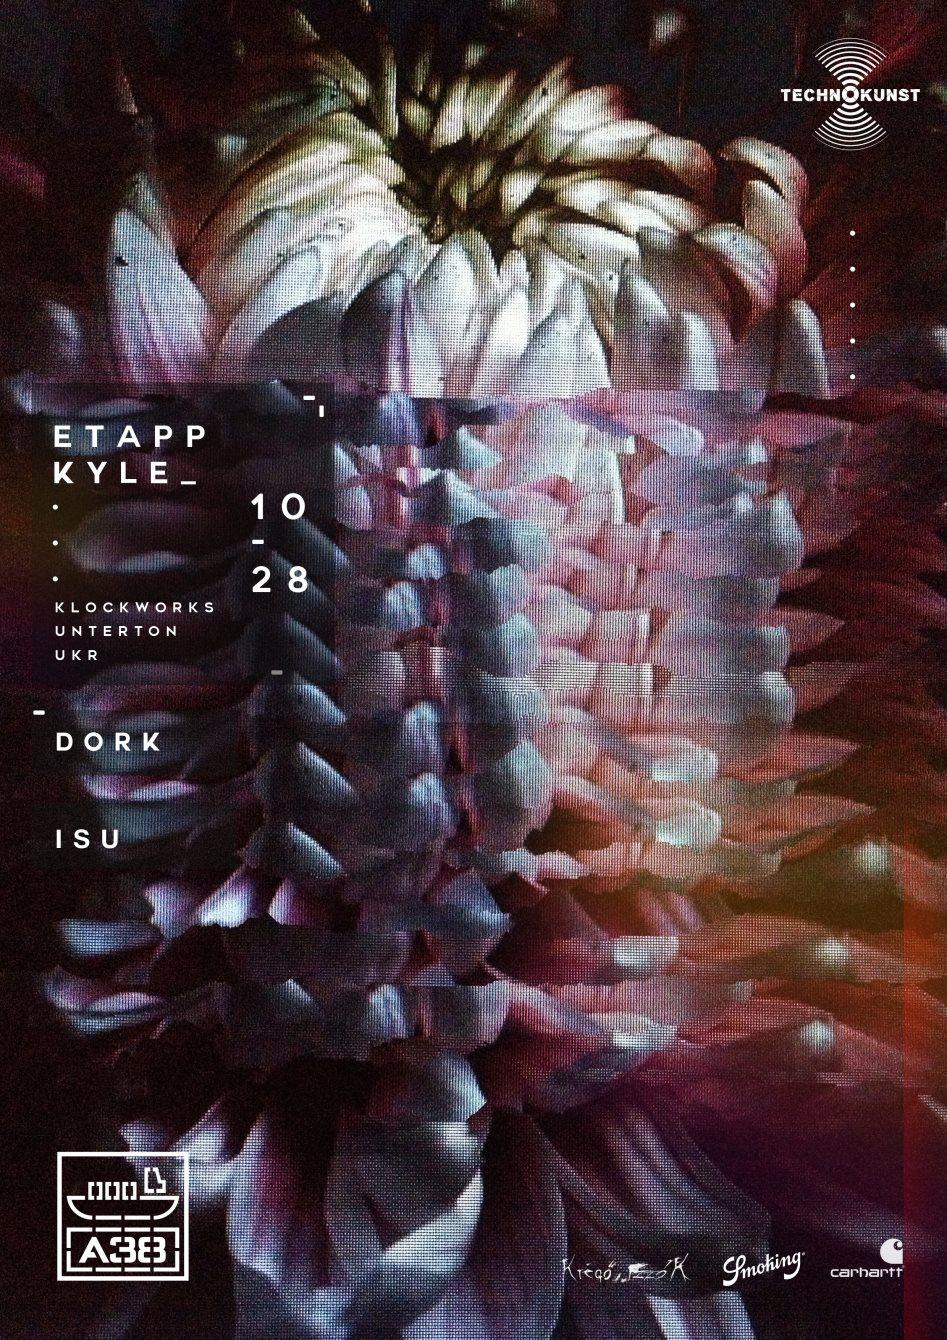 Technokunst with Etapp Kyle - Flyer front